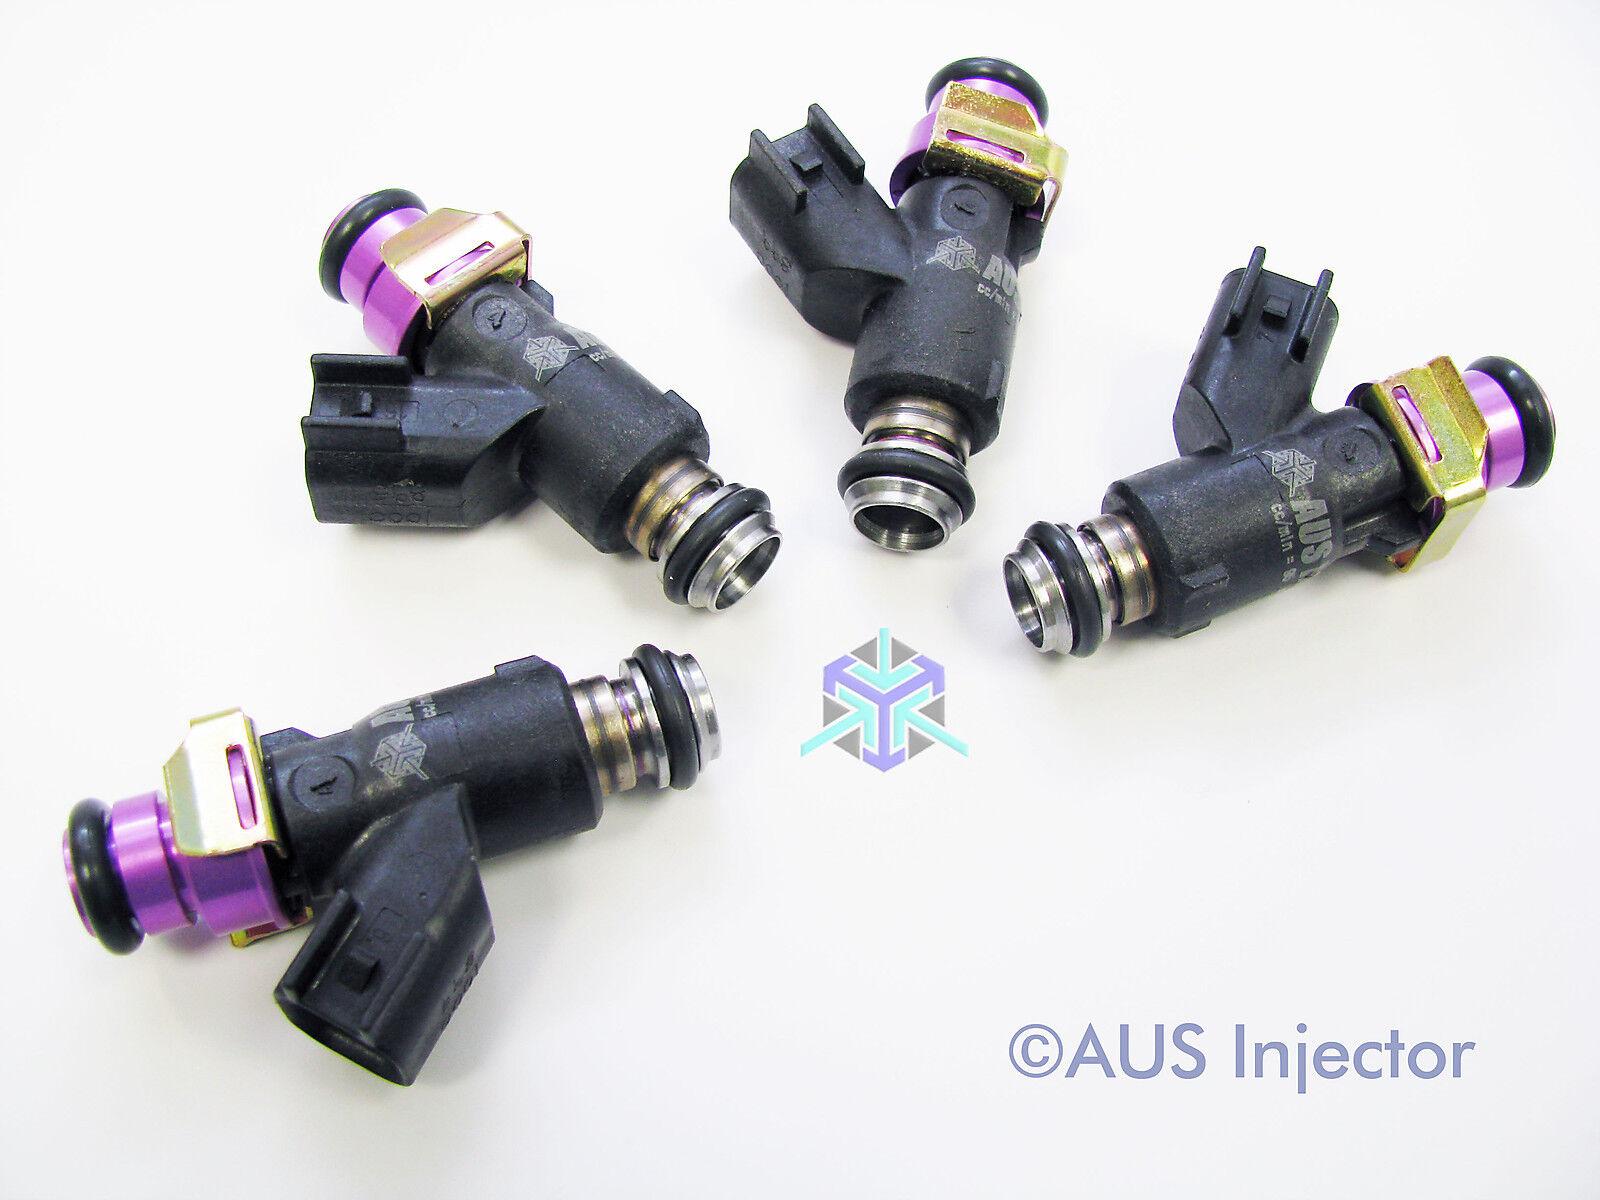 1200cc 114 Lbs HIGH FLOW Racing Injectors fit DODGE Caliber Neon SRT-4 [AUSE4-0]